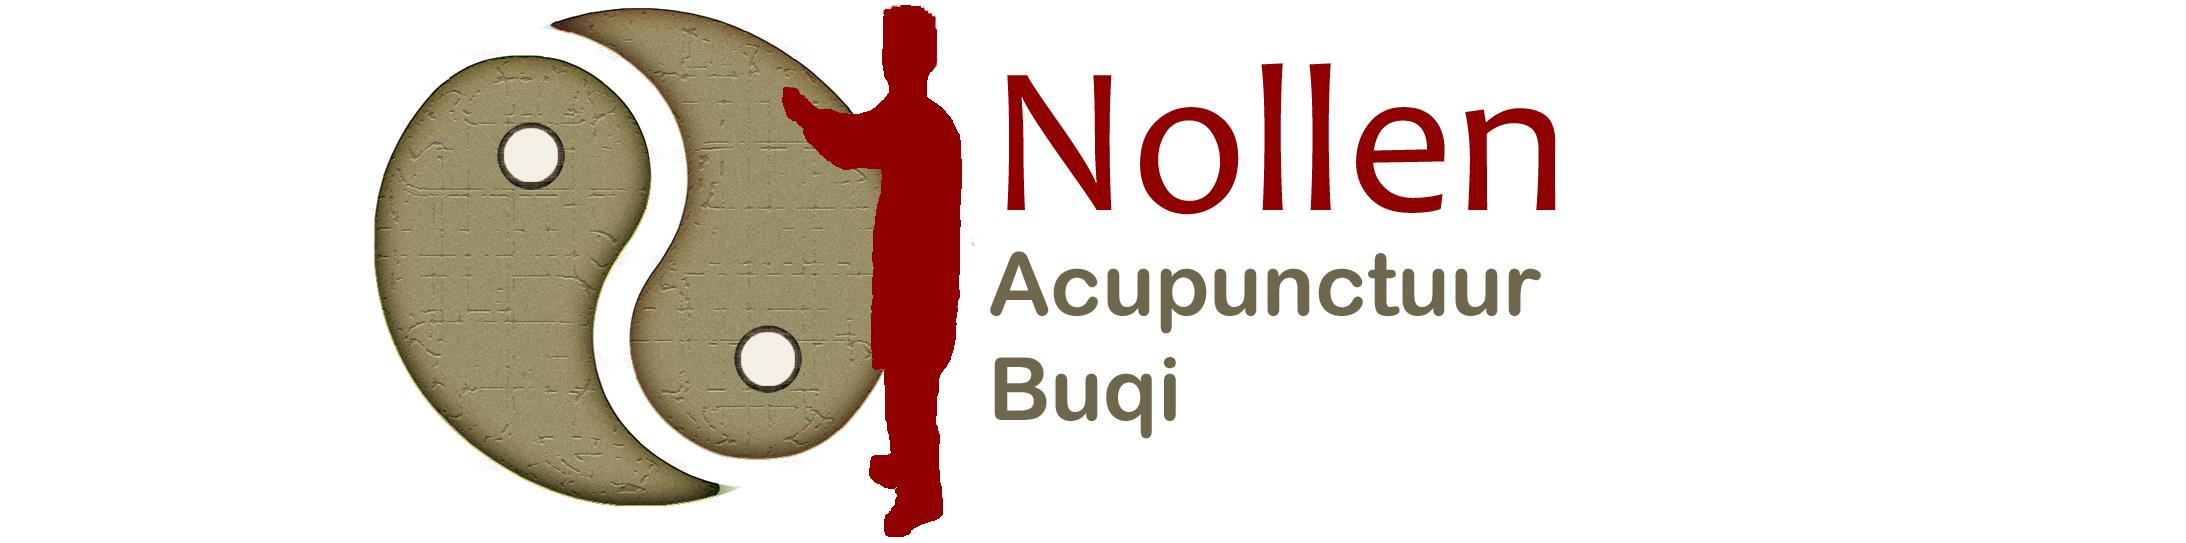 Acupunctuur Buqi Nollen Deventer/Bathmen